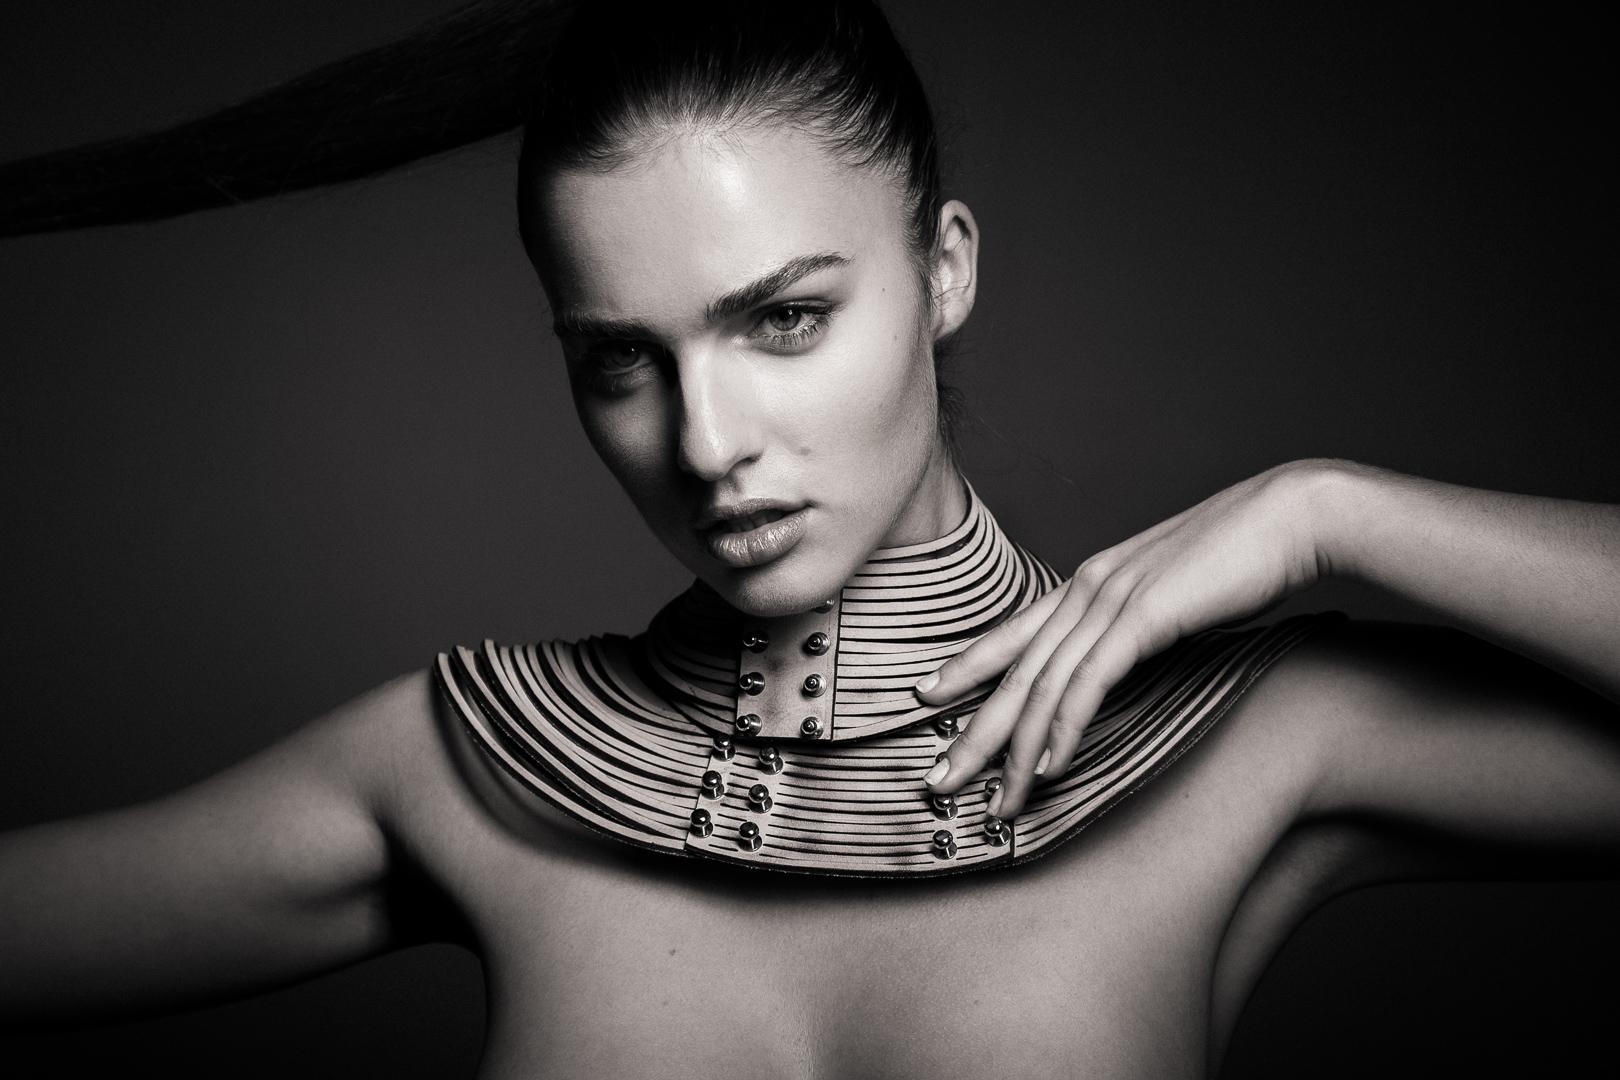 Photos Melanie Paul nudes (25 foto and video), Sexy, Bikini, Selfie, lingerie 2017